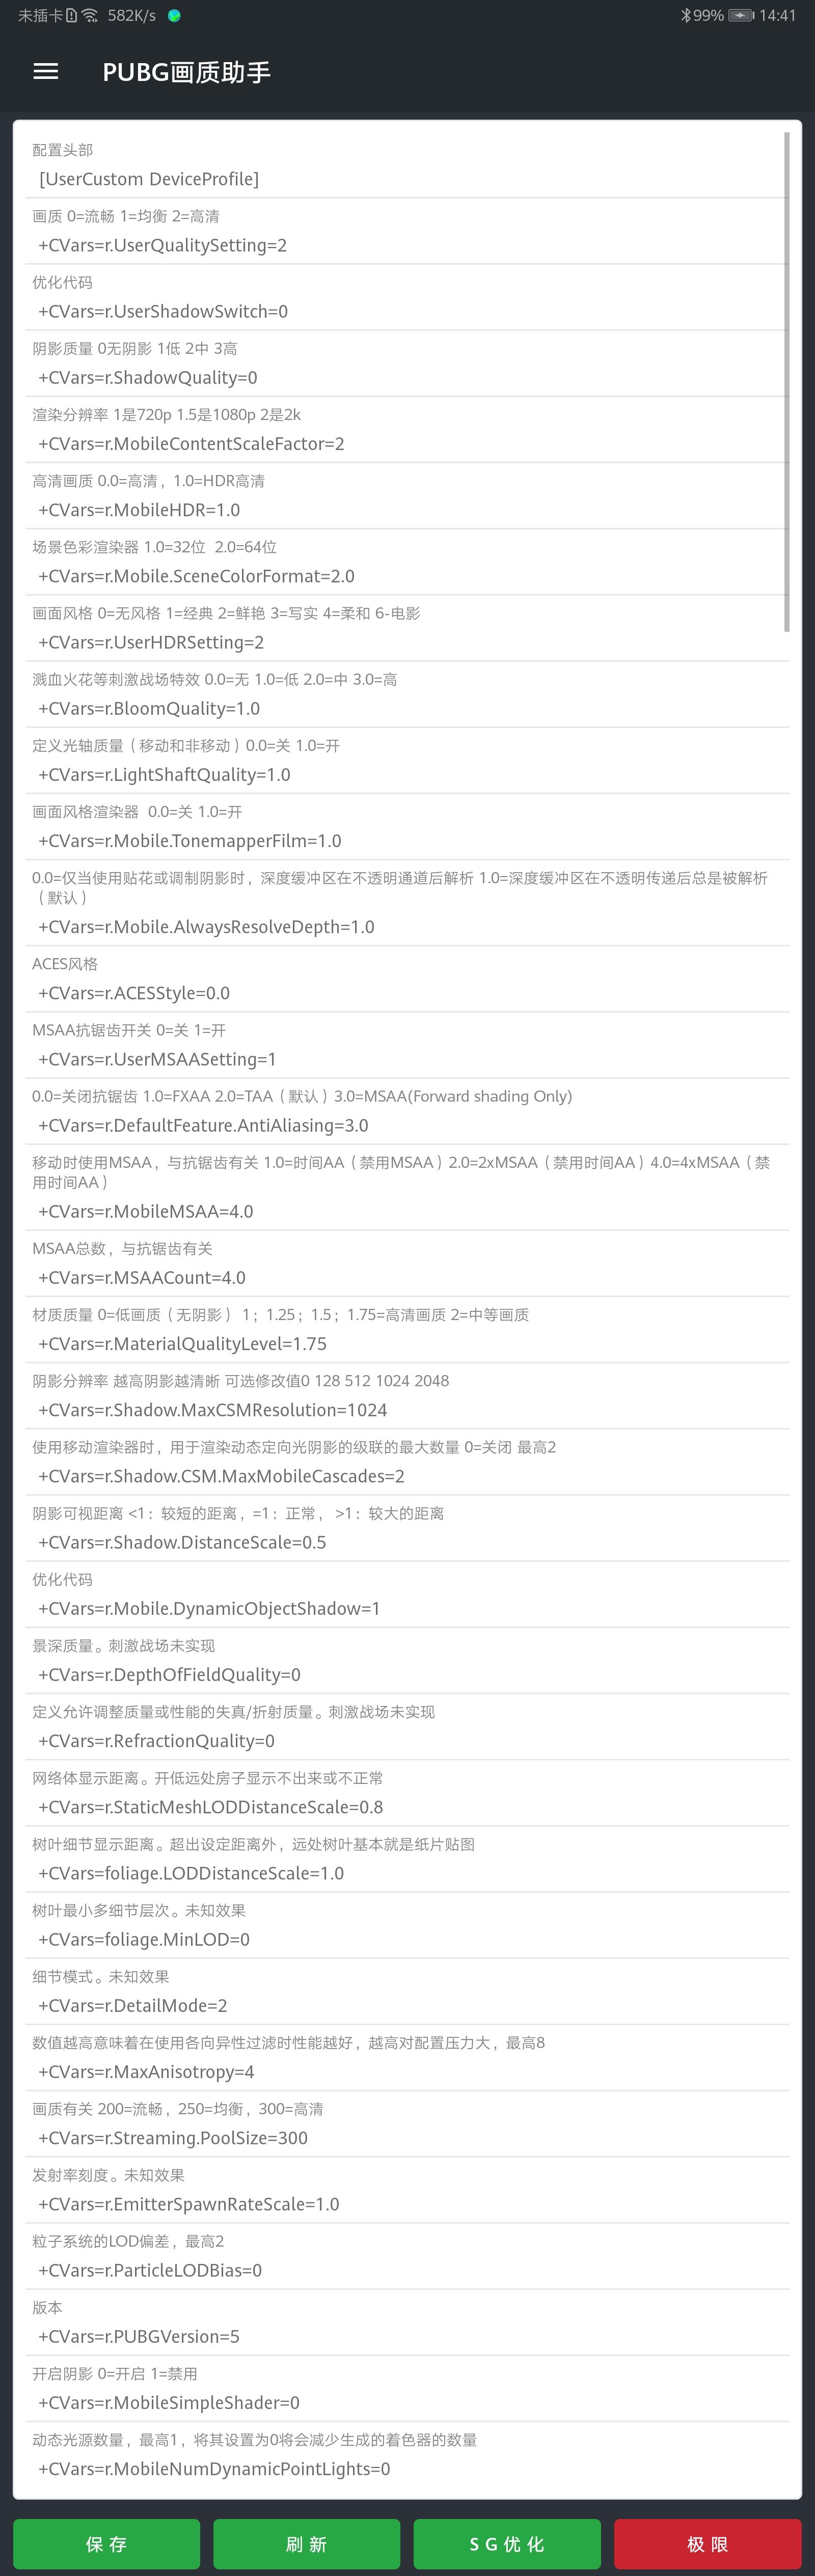 Screenshot_20190822_144112_com.pubg.change.jpg